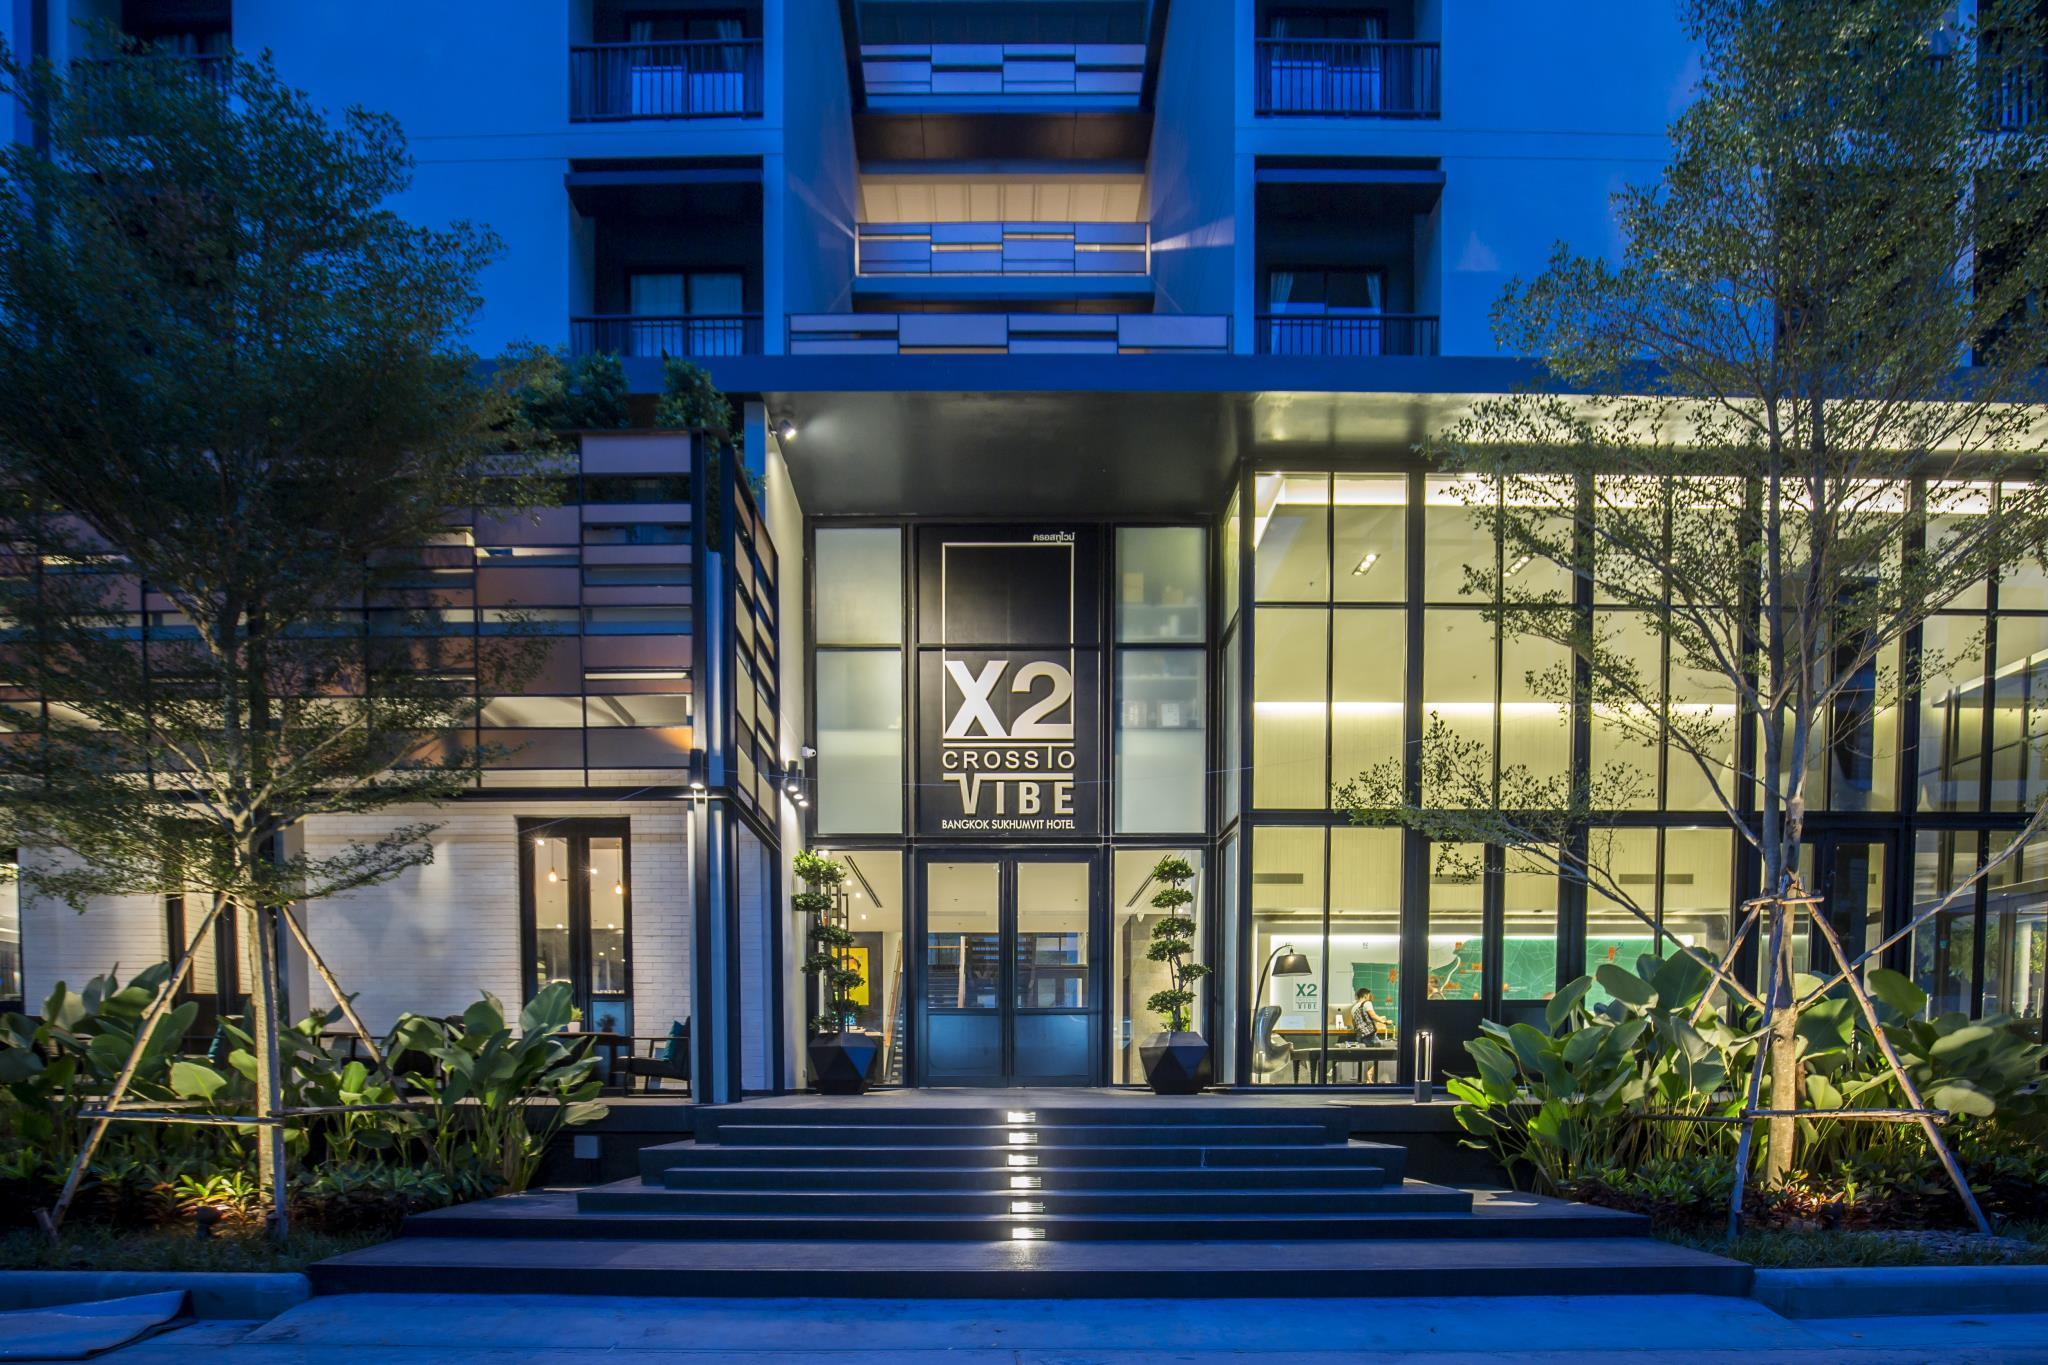 X2 Vibe Bangkok Sukhumvit